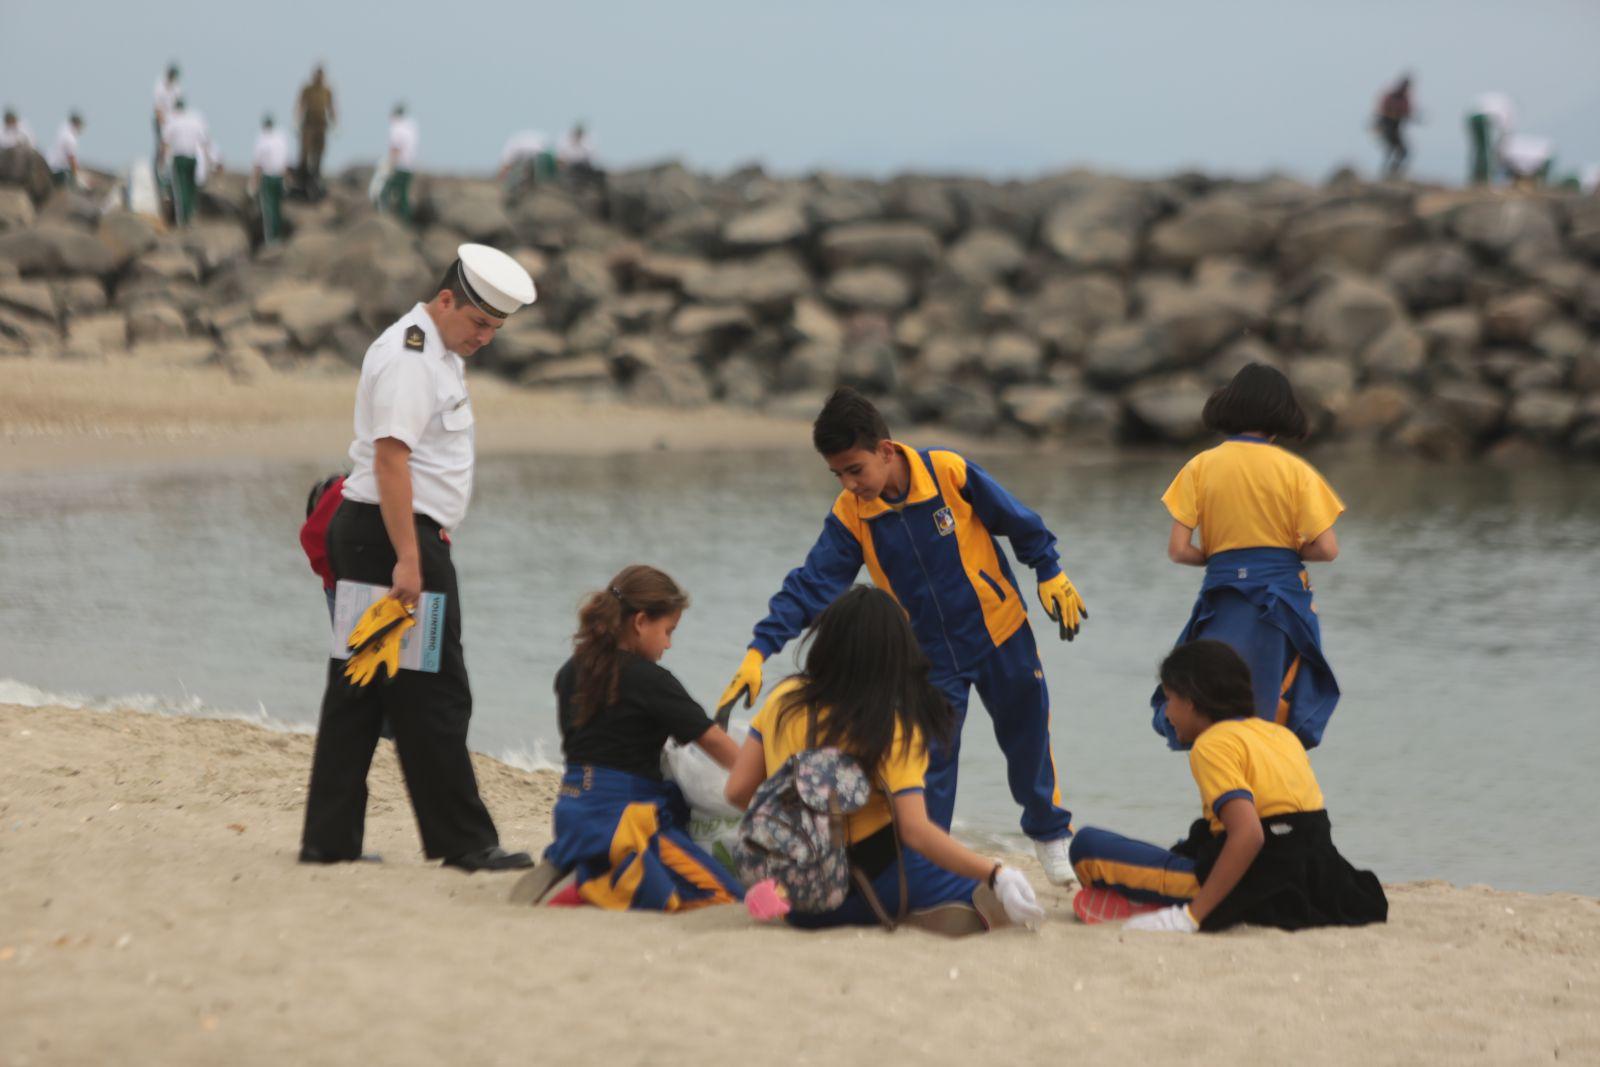 mas-de-6-toneladas-de-basura-fueron-retiradas-desde-playa-paraiso